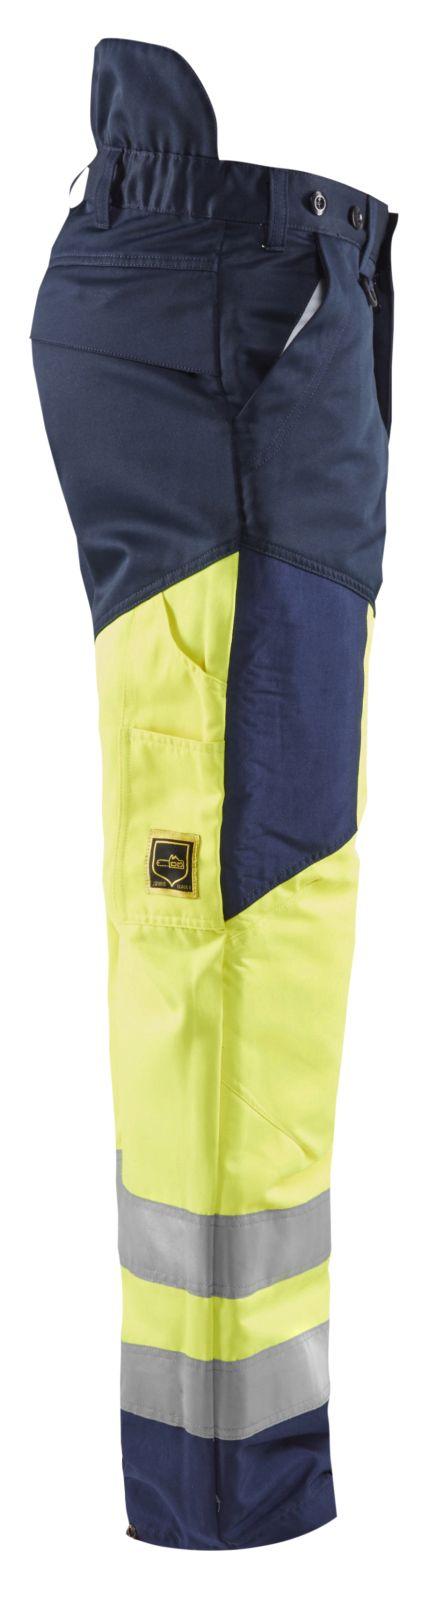 Blaklader Broeken 19201900 High Vis geel-marineblauw(3389)